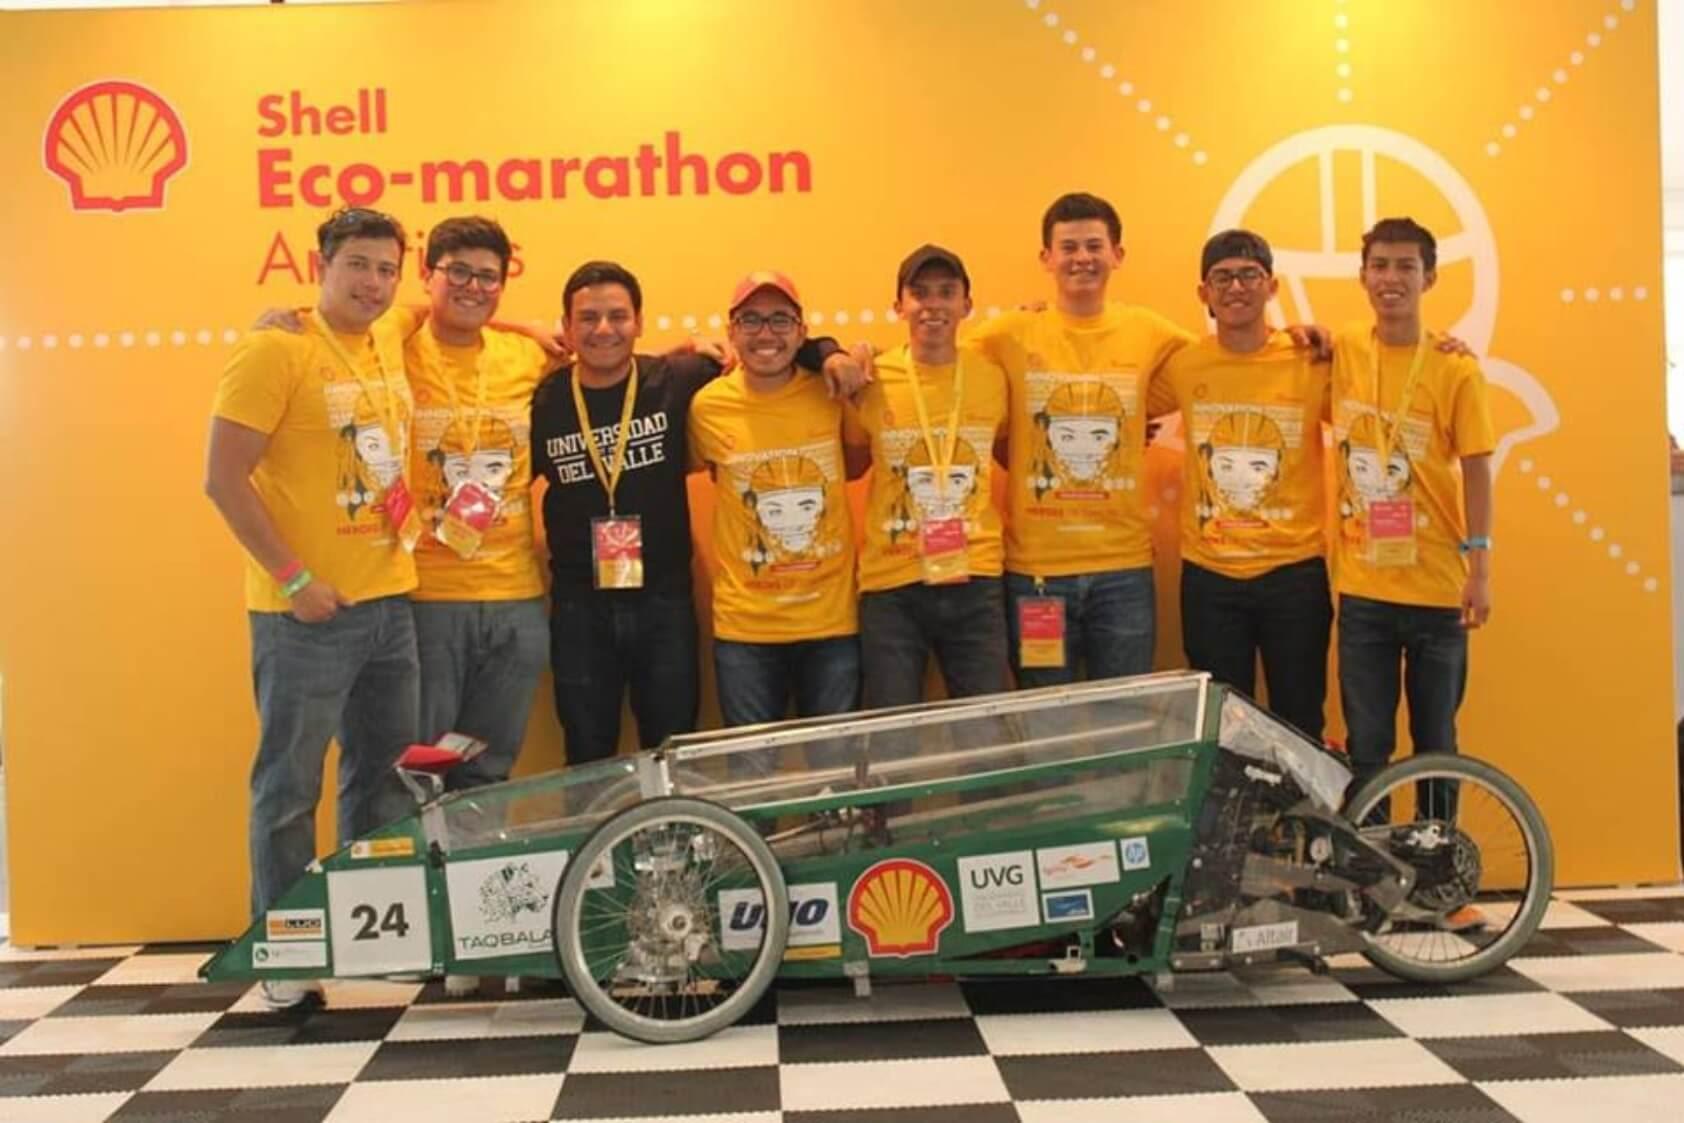 Shell Ecomarathon 2018